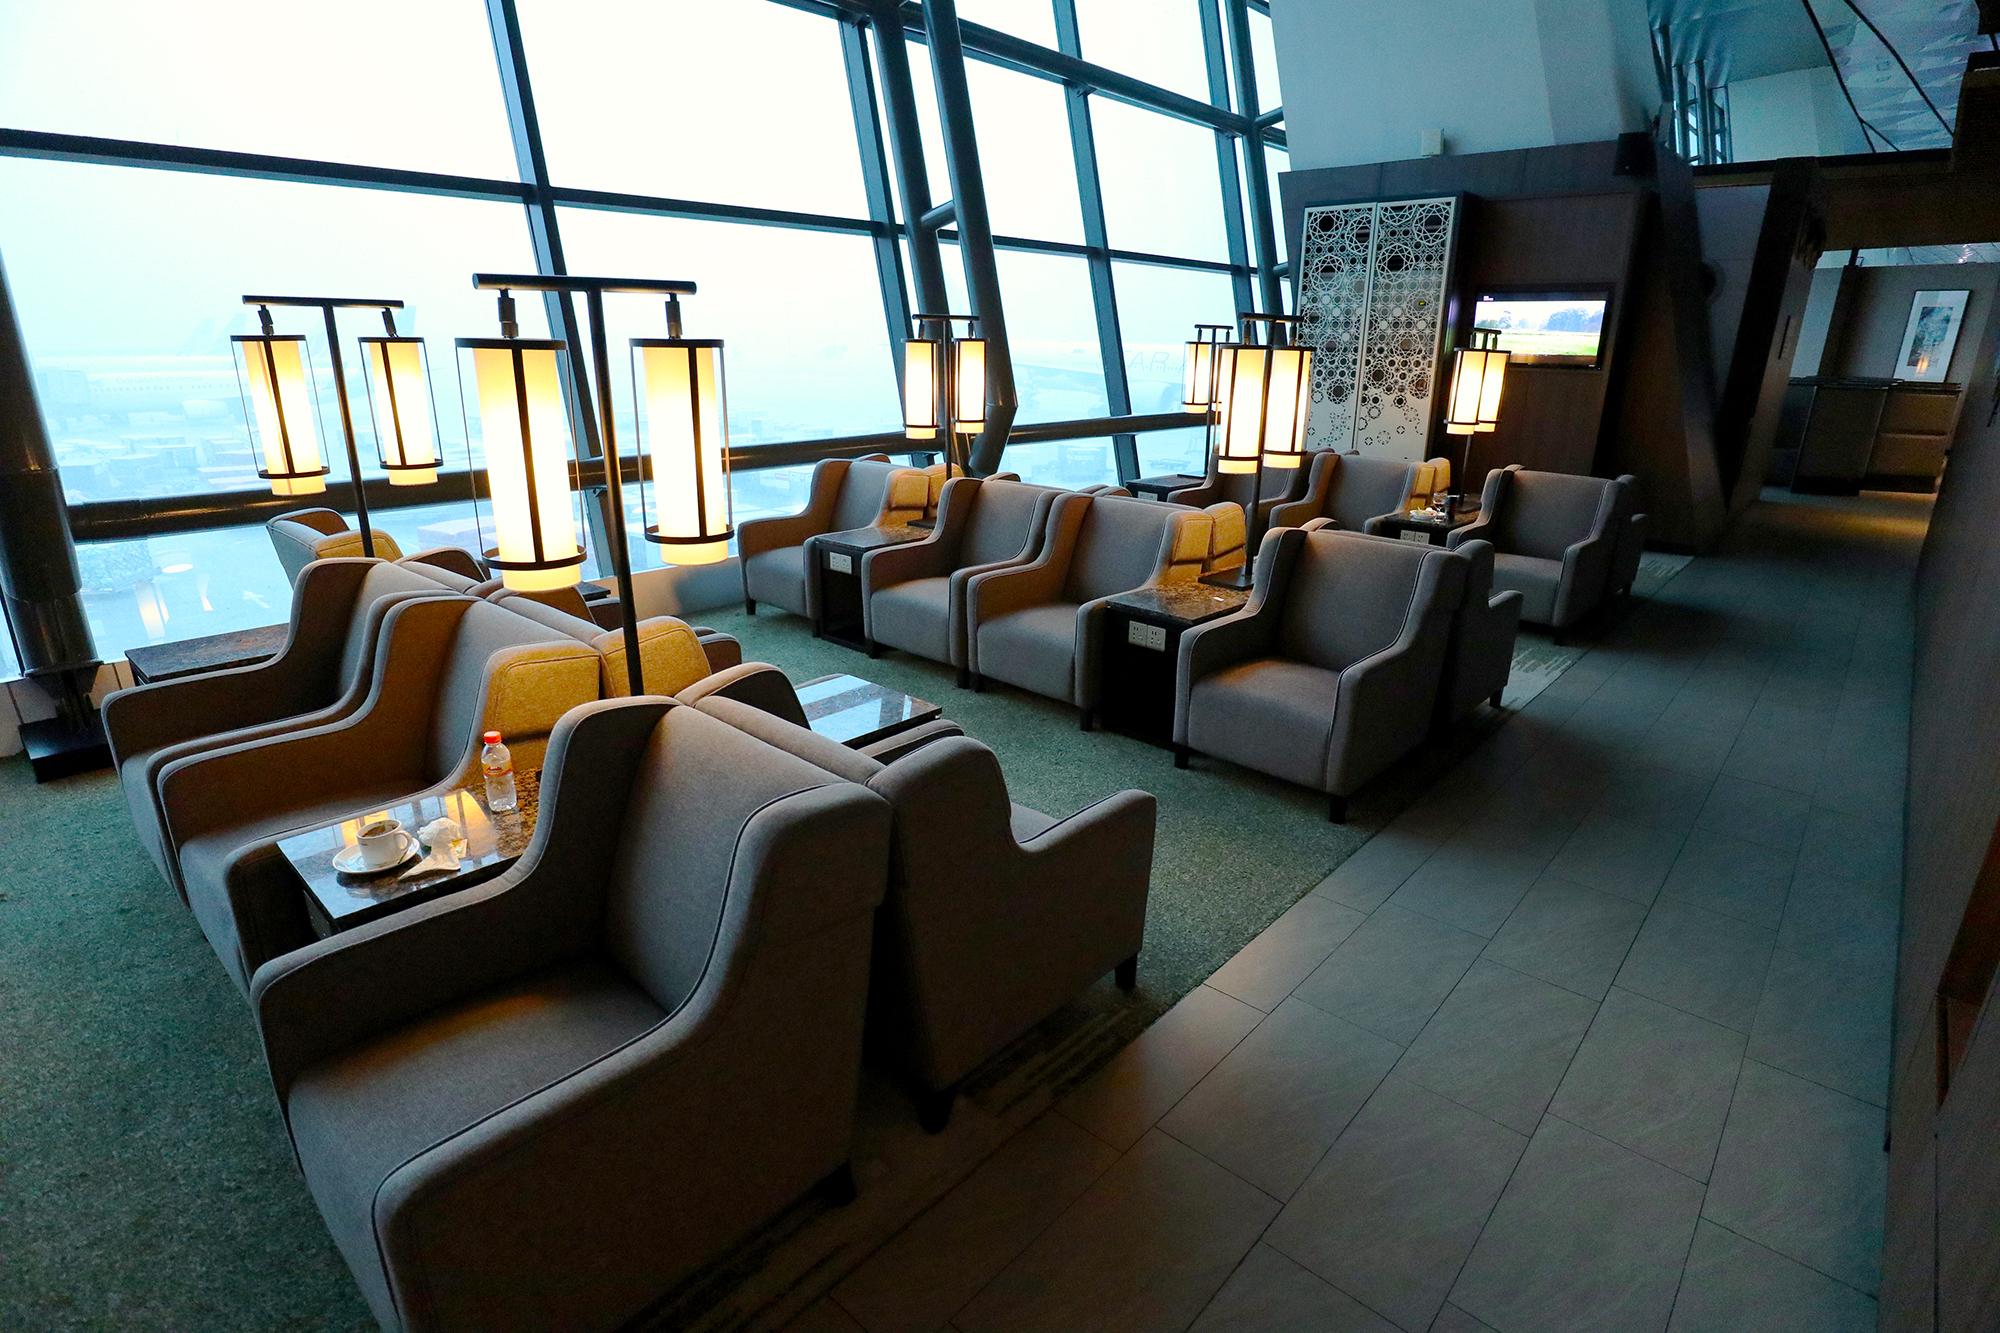 Seats Armchair